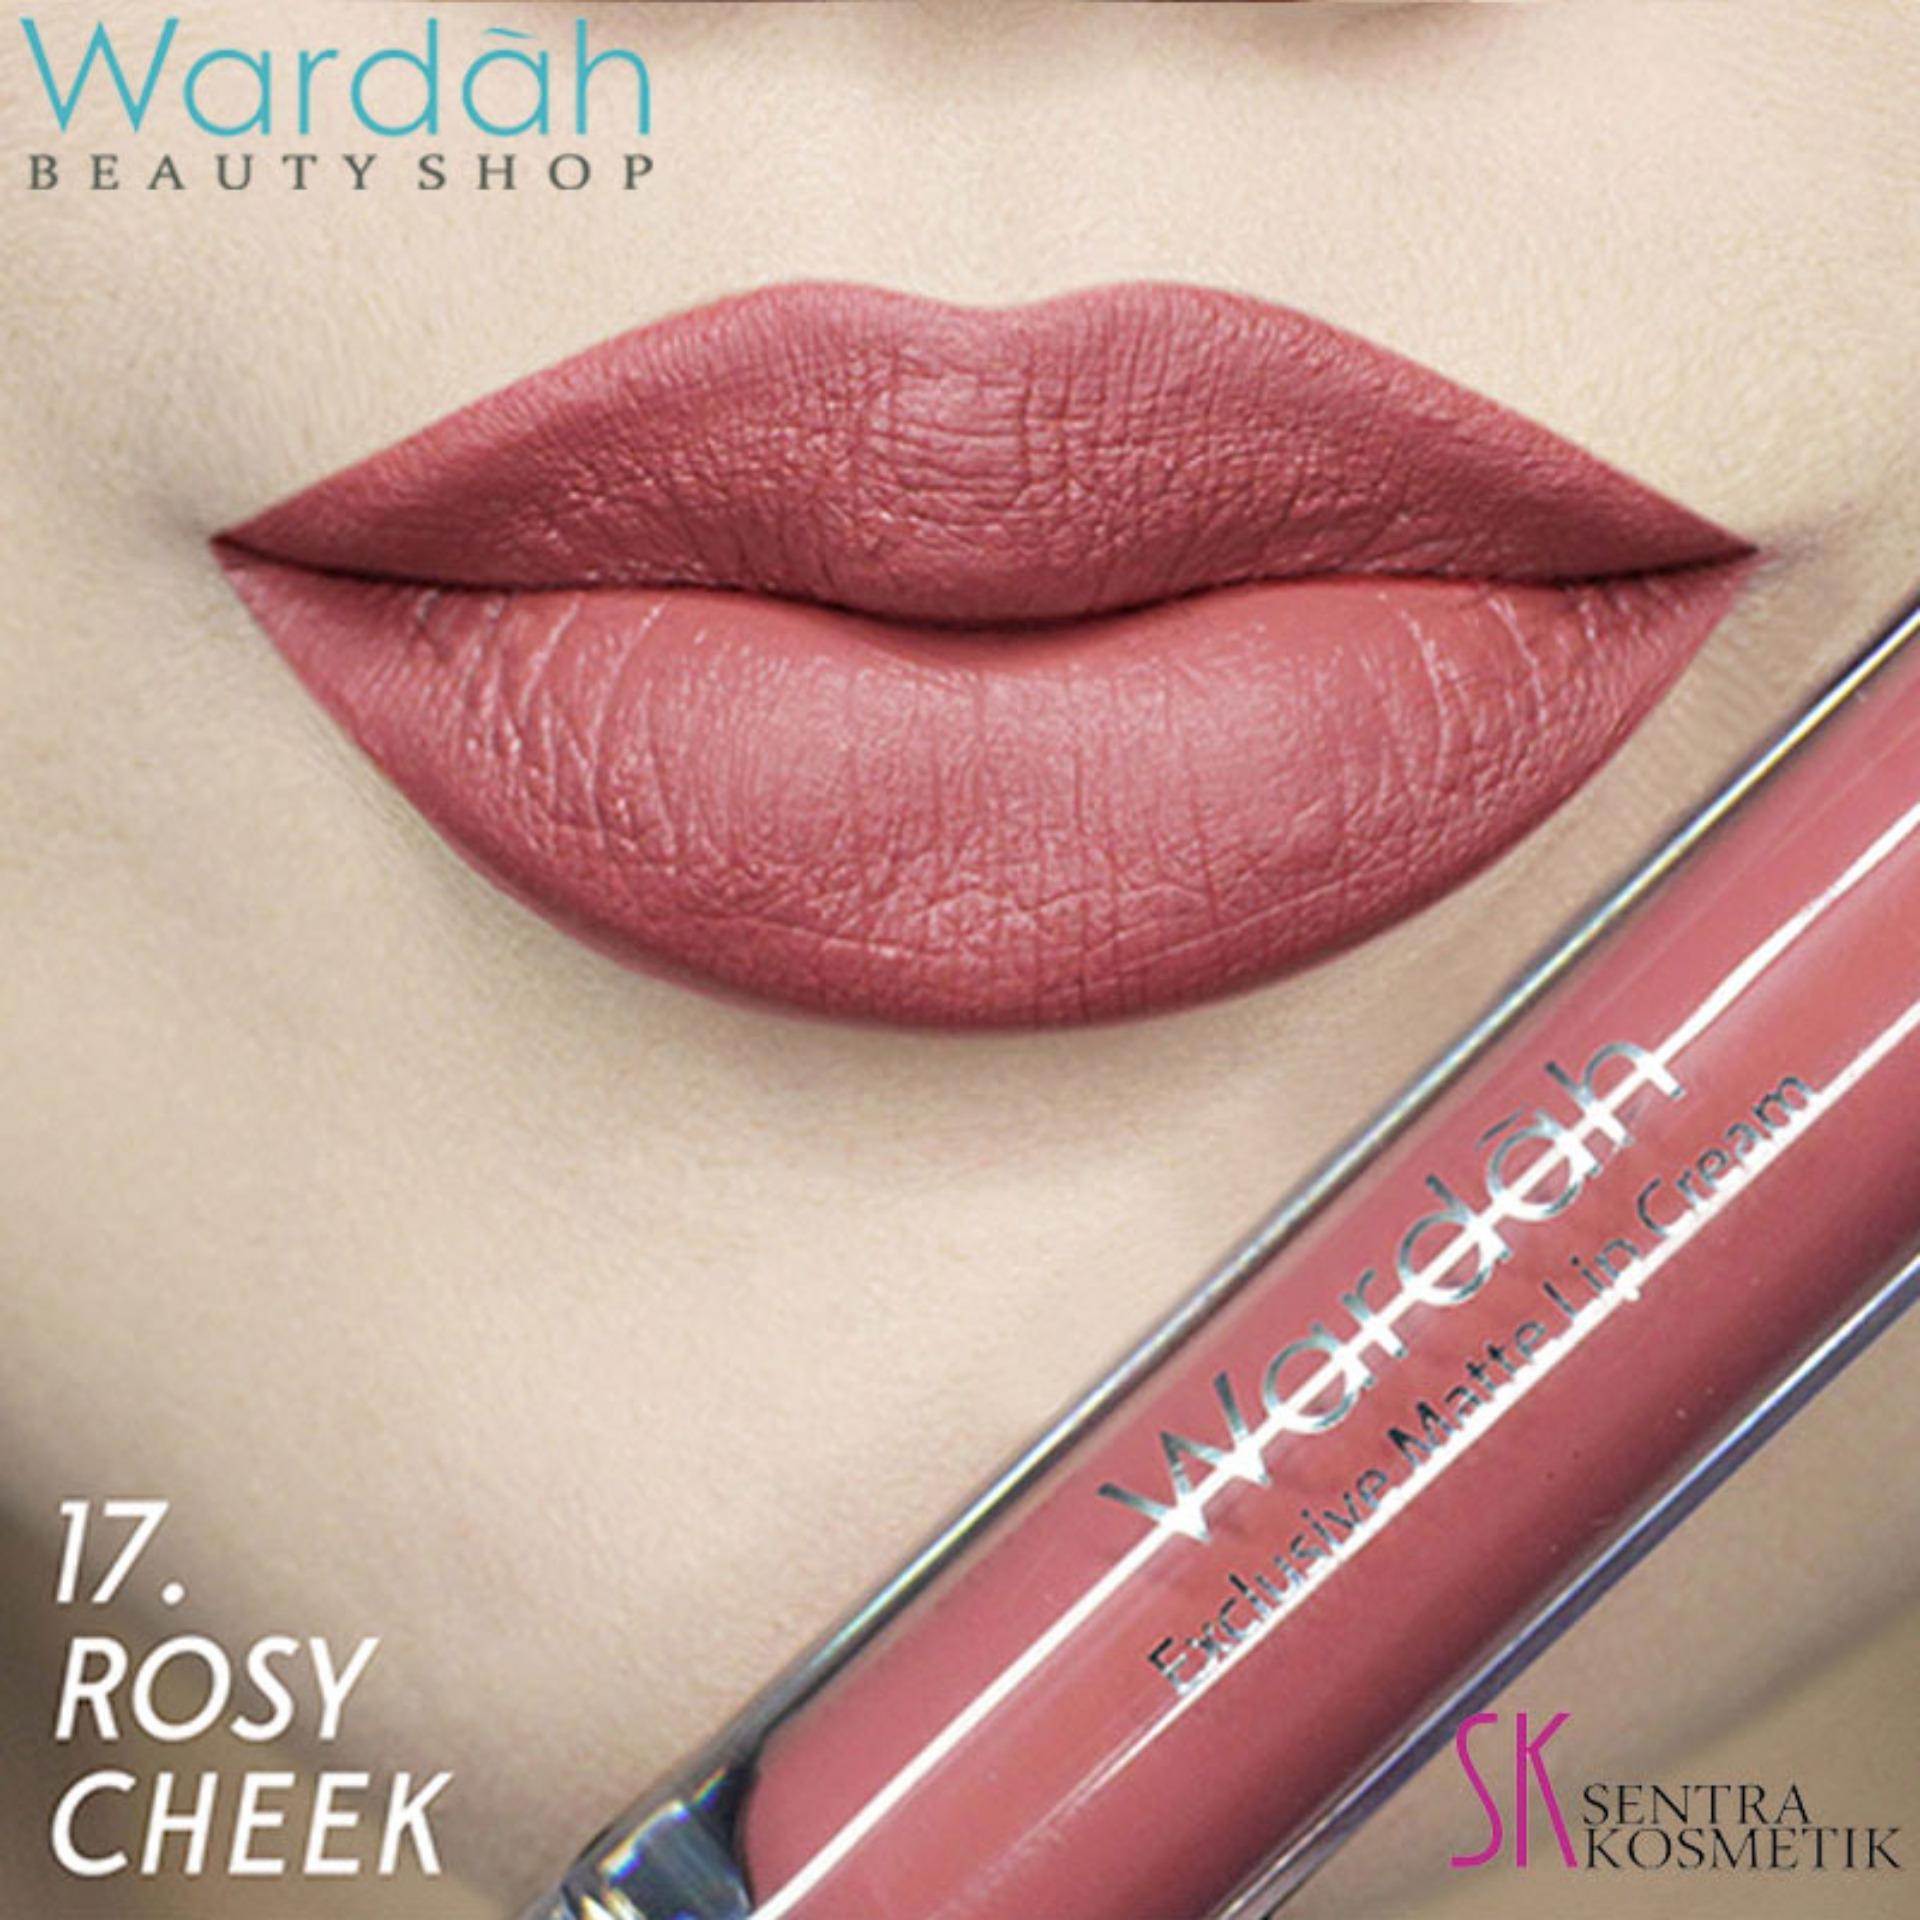 Wardah Exclusive MATTE LIP CREAM 17 - Rosy Cheek